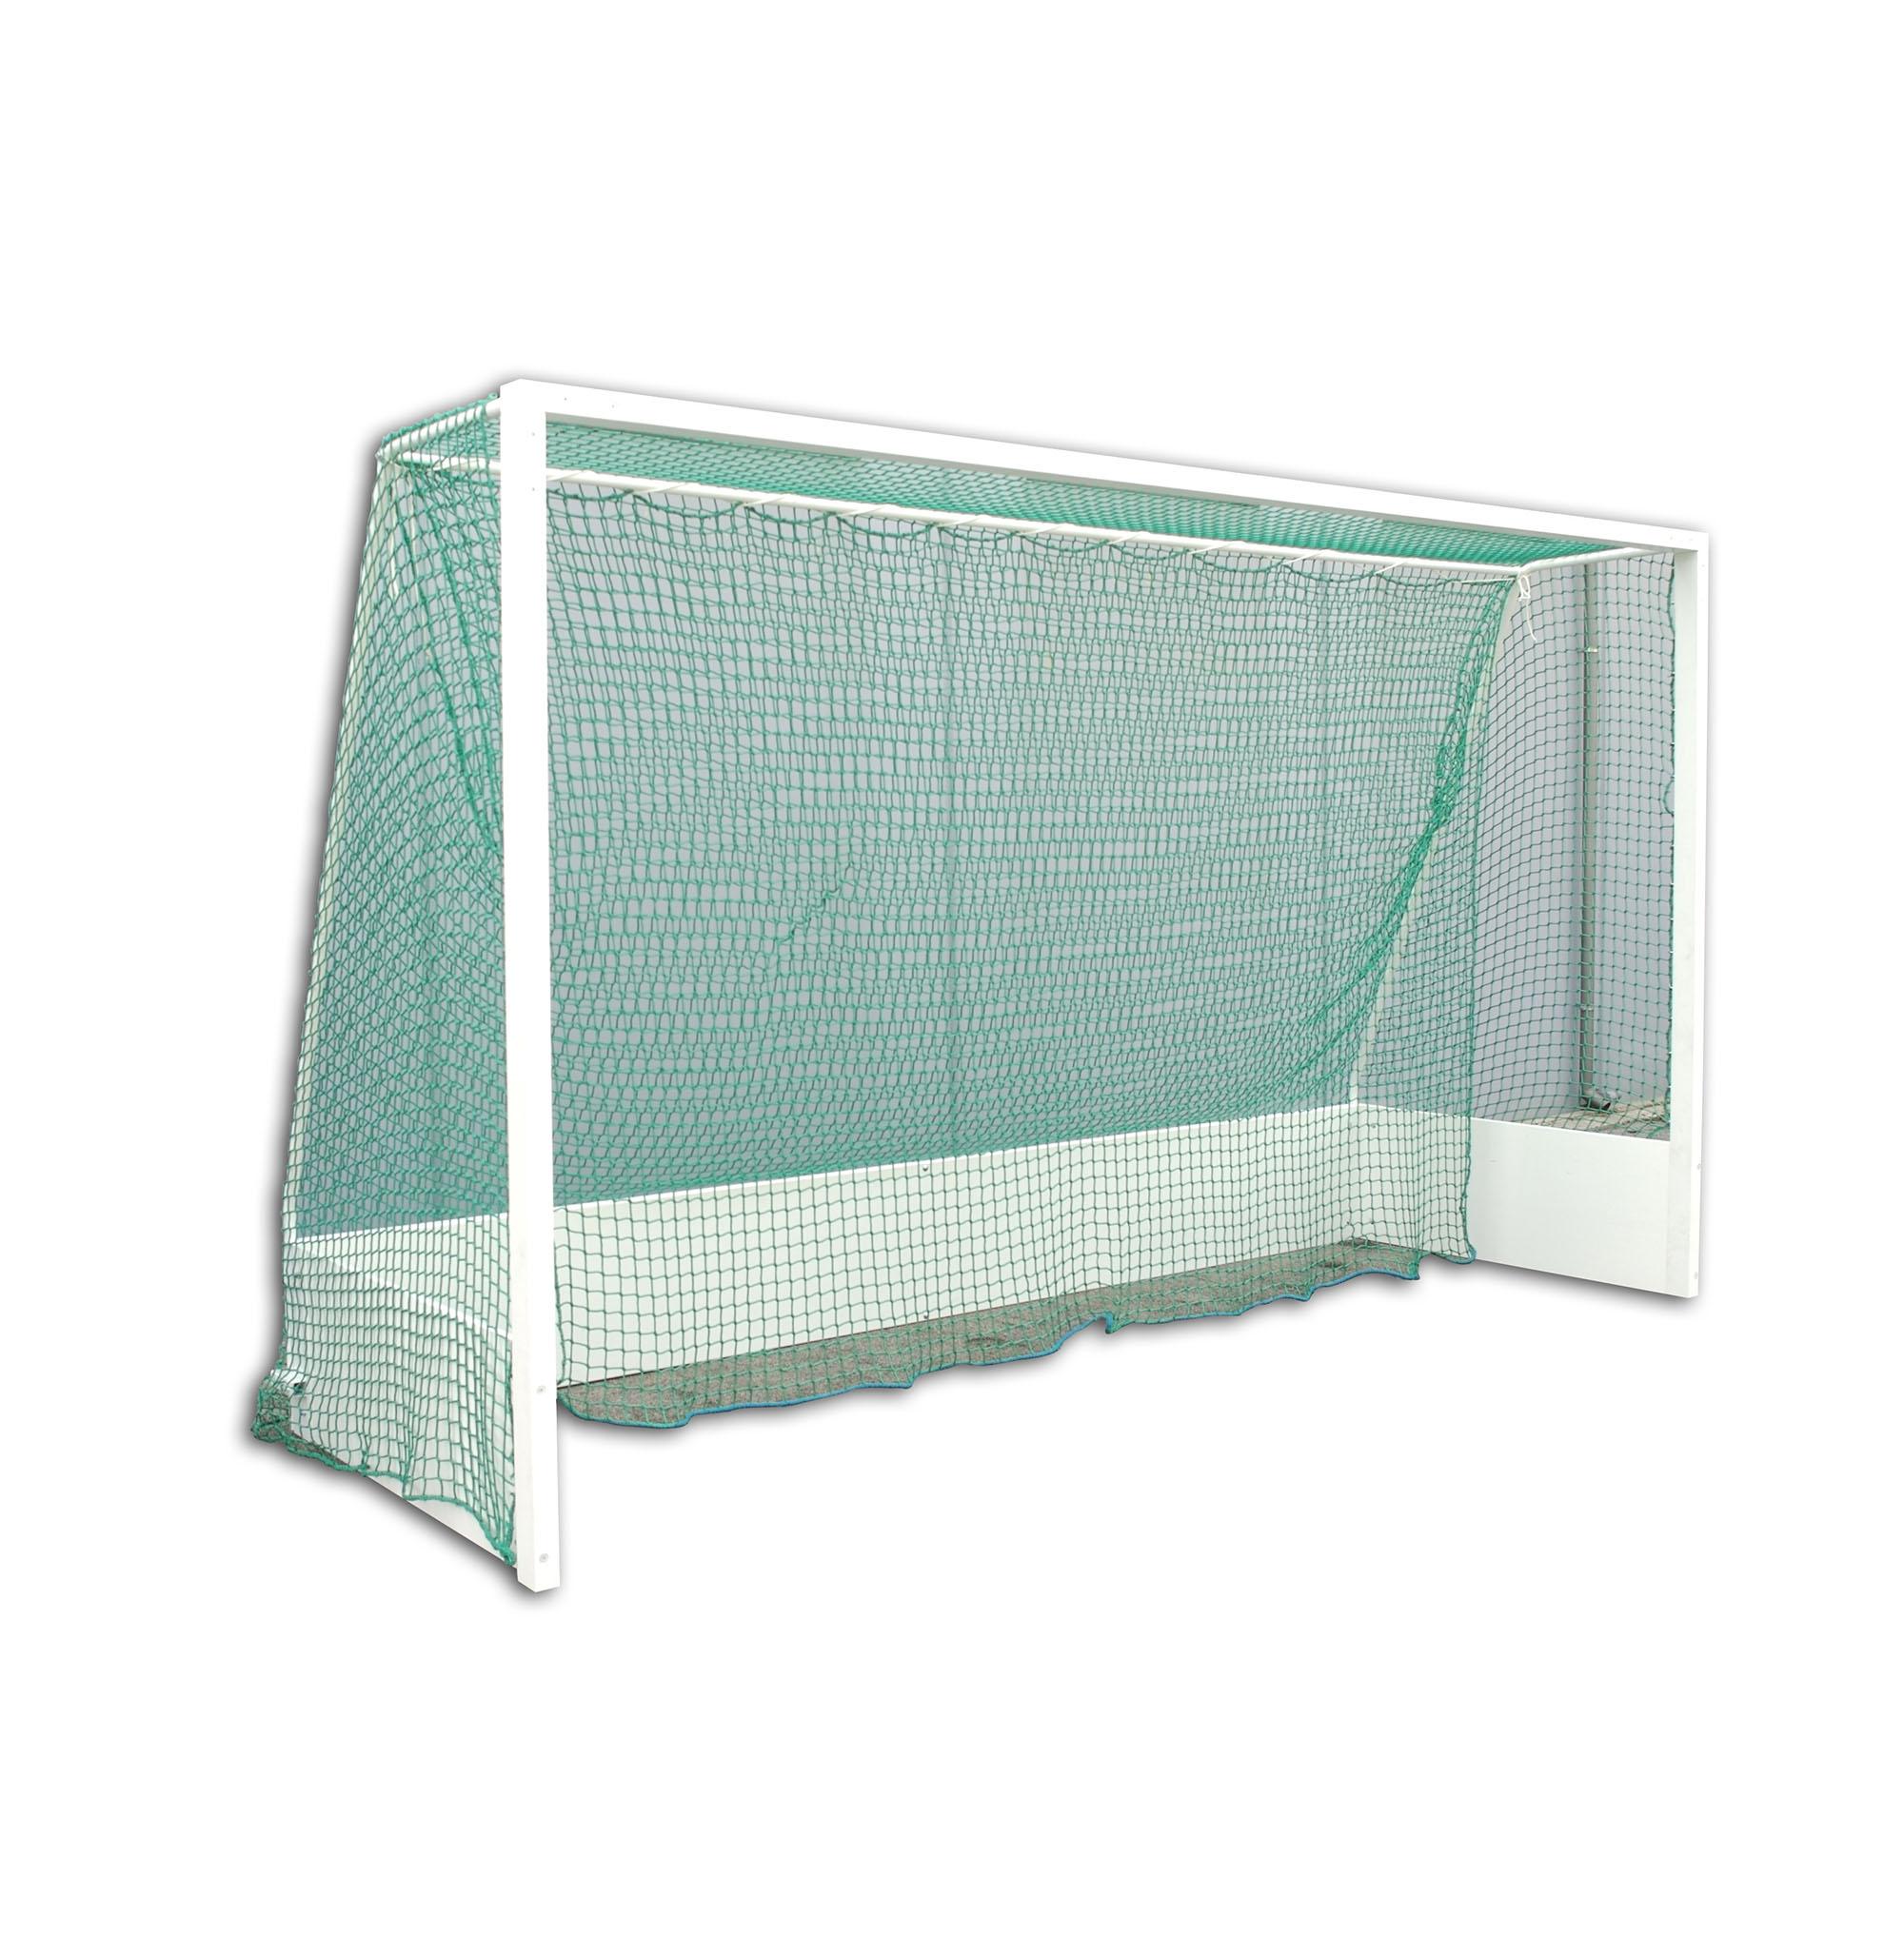 Arco para hockey modelo S05122 césped